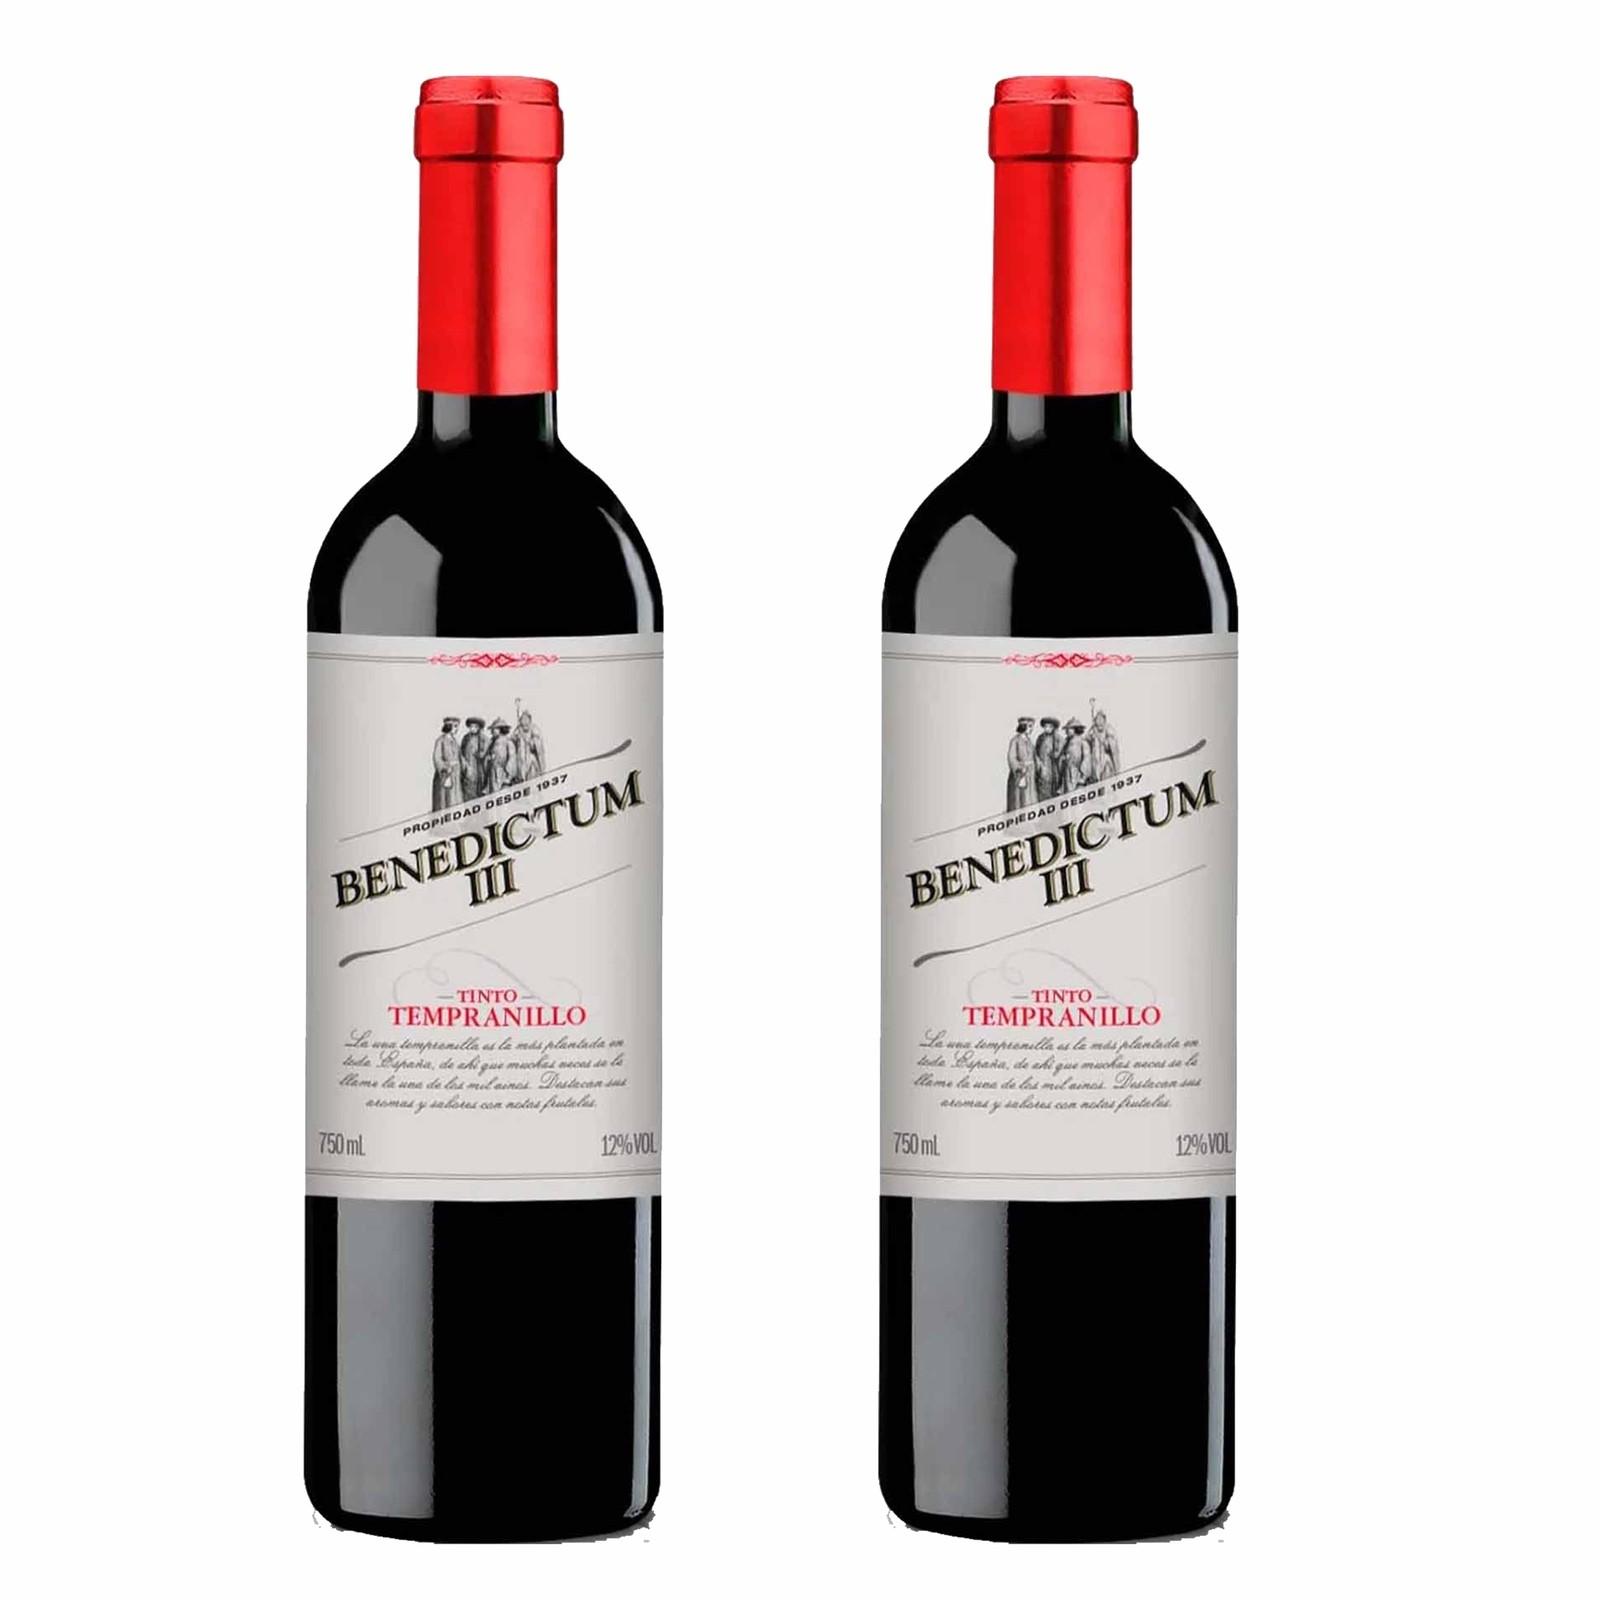 Kit 2x Vinho Tinto Espanhol Benedictum III Tempranillo 2019 750ml